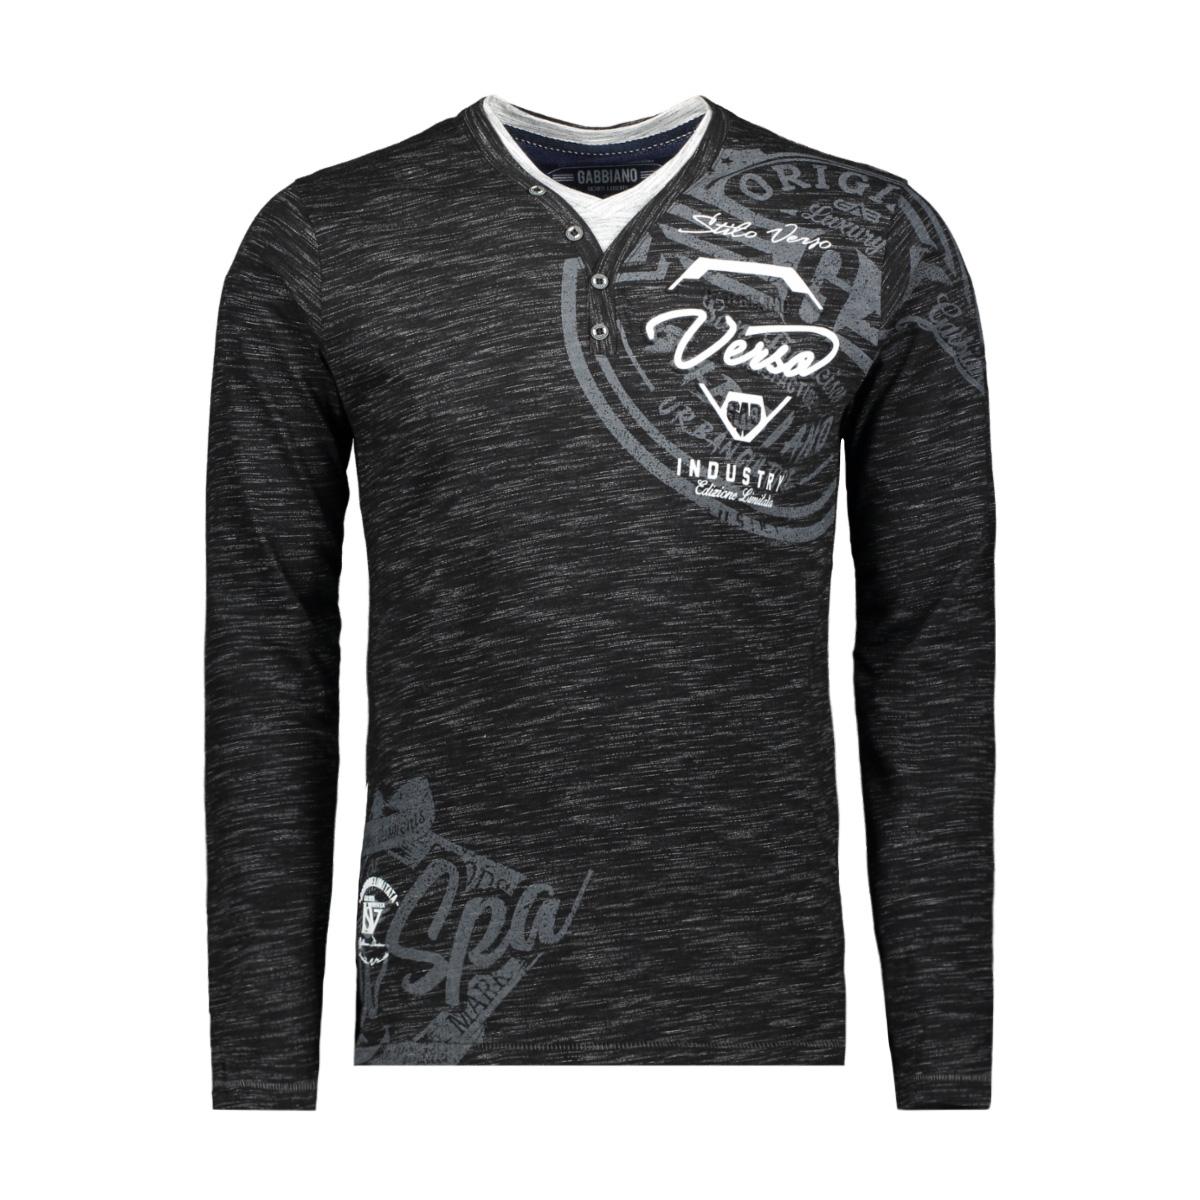 13855 gabbiano t-shirt black